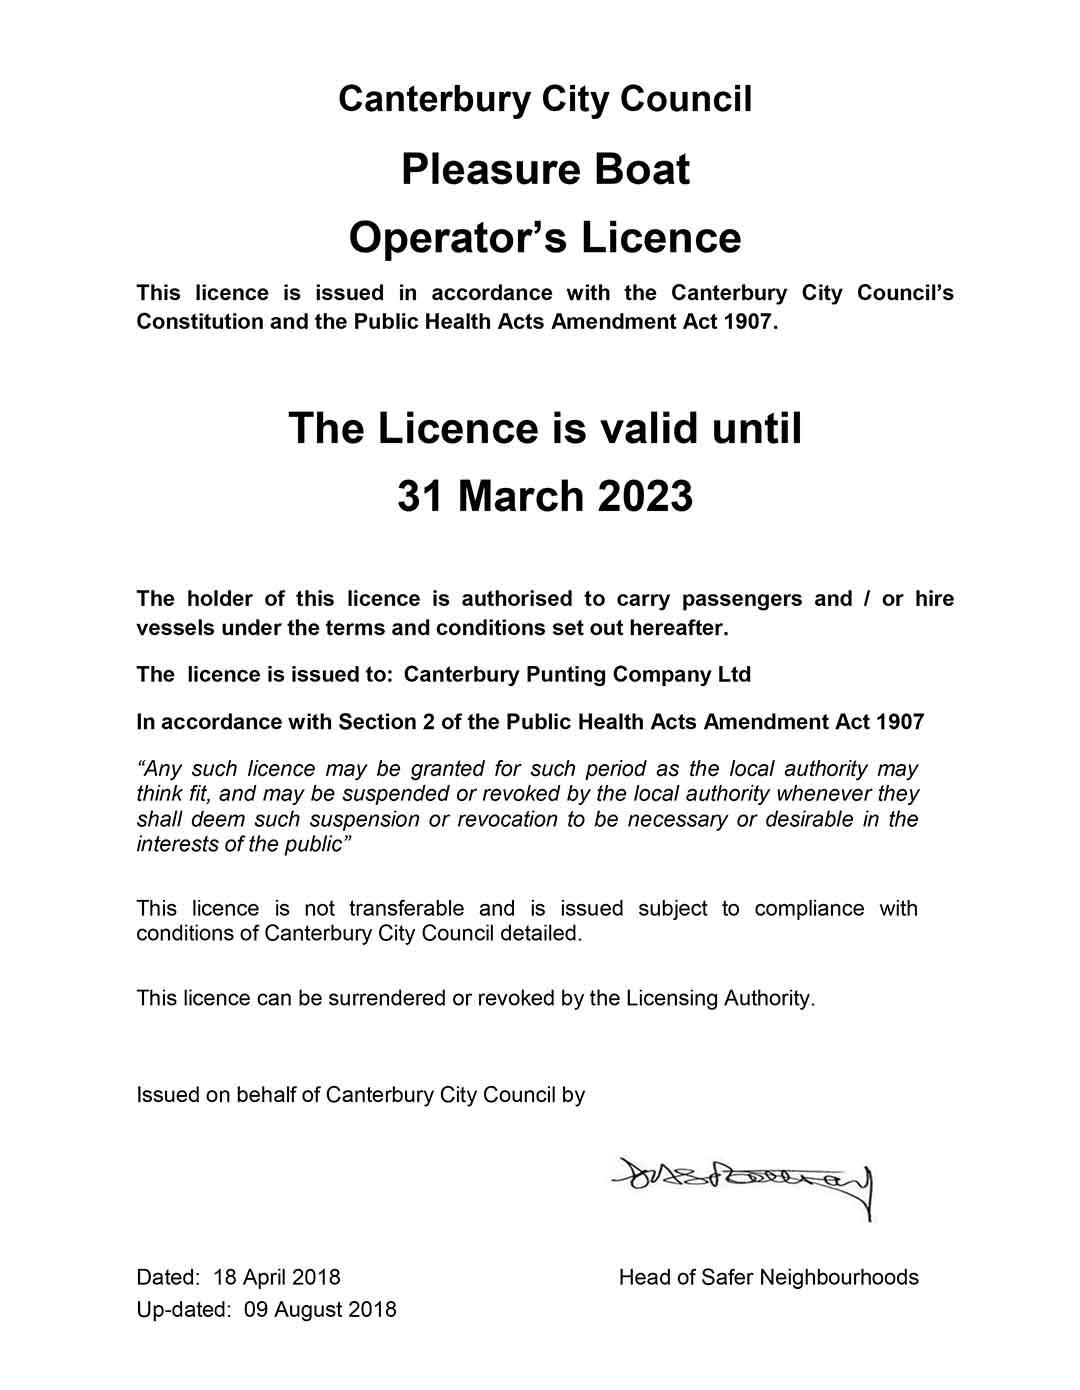 Operators Licence